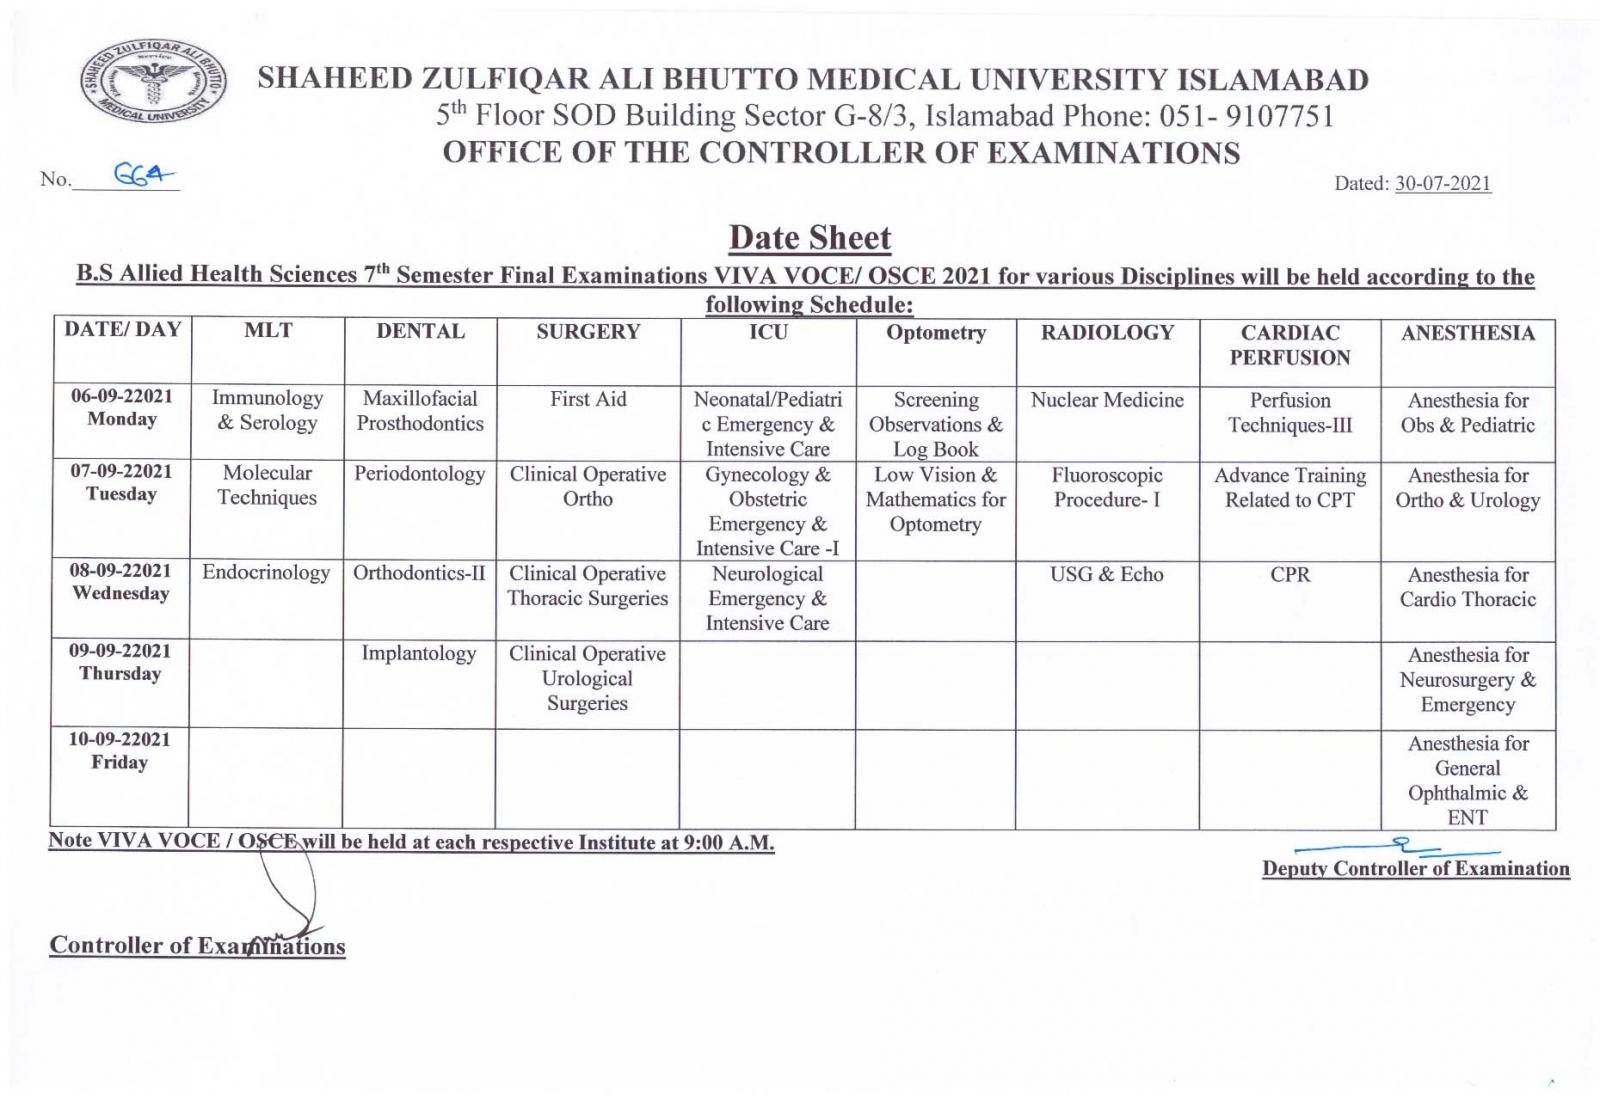 Date Sheet - BS AHS 7th Semester Final Examinations 2021